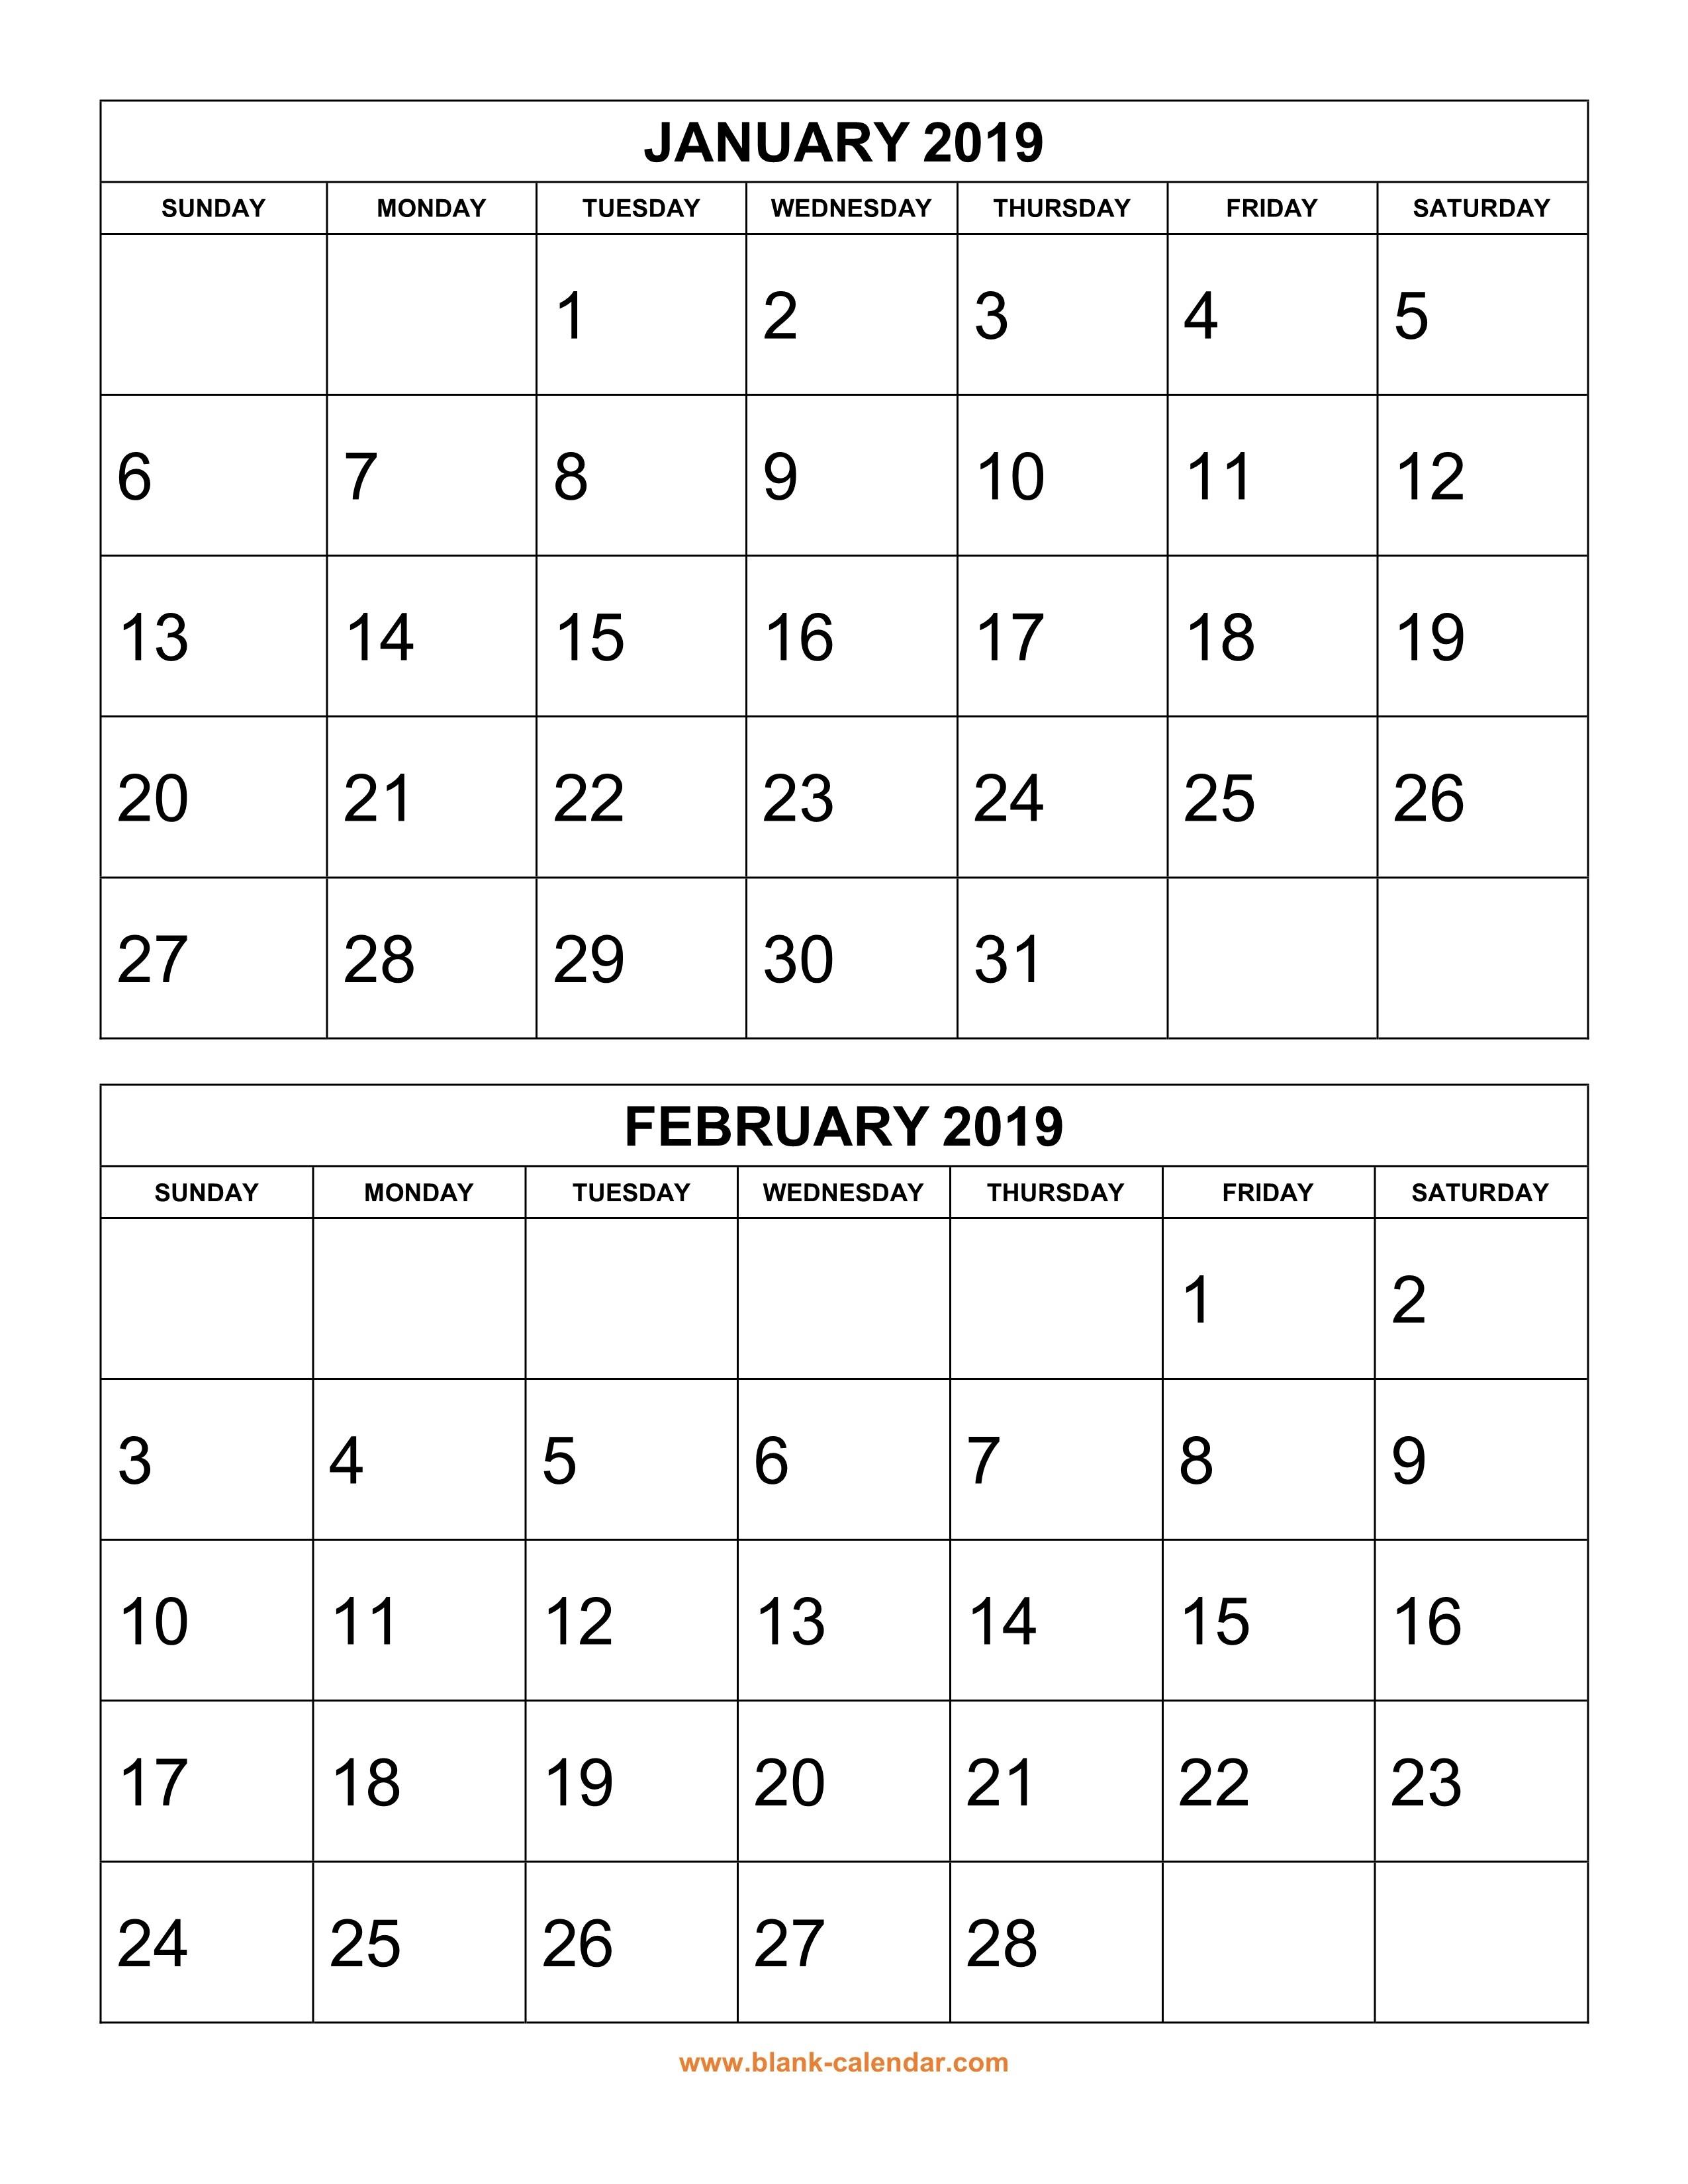 Free Download Printable Calendar 2019, 2 Months Per Page, 6-Print Blank Calendar 6 Months Per Page